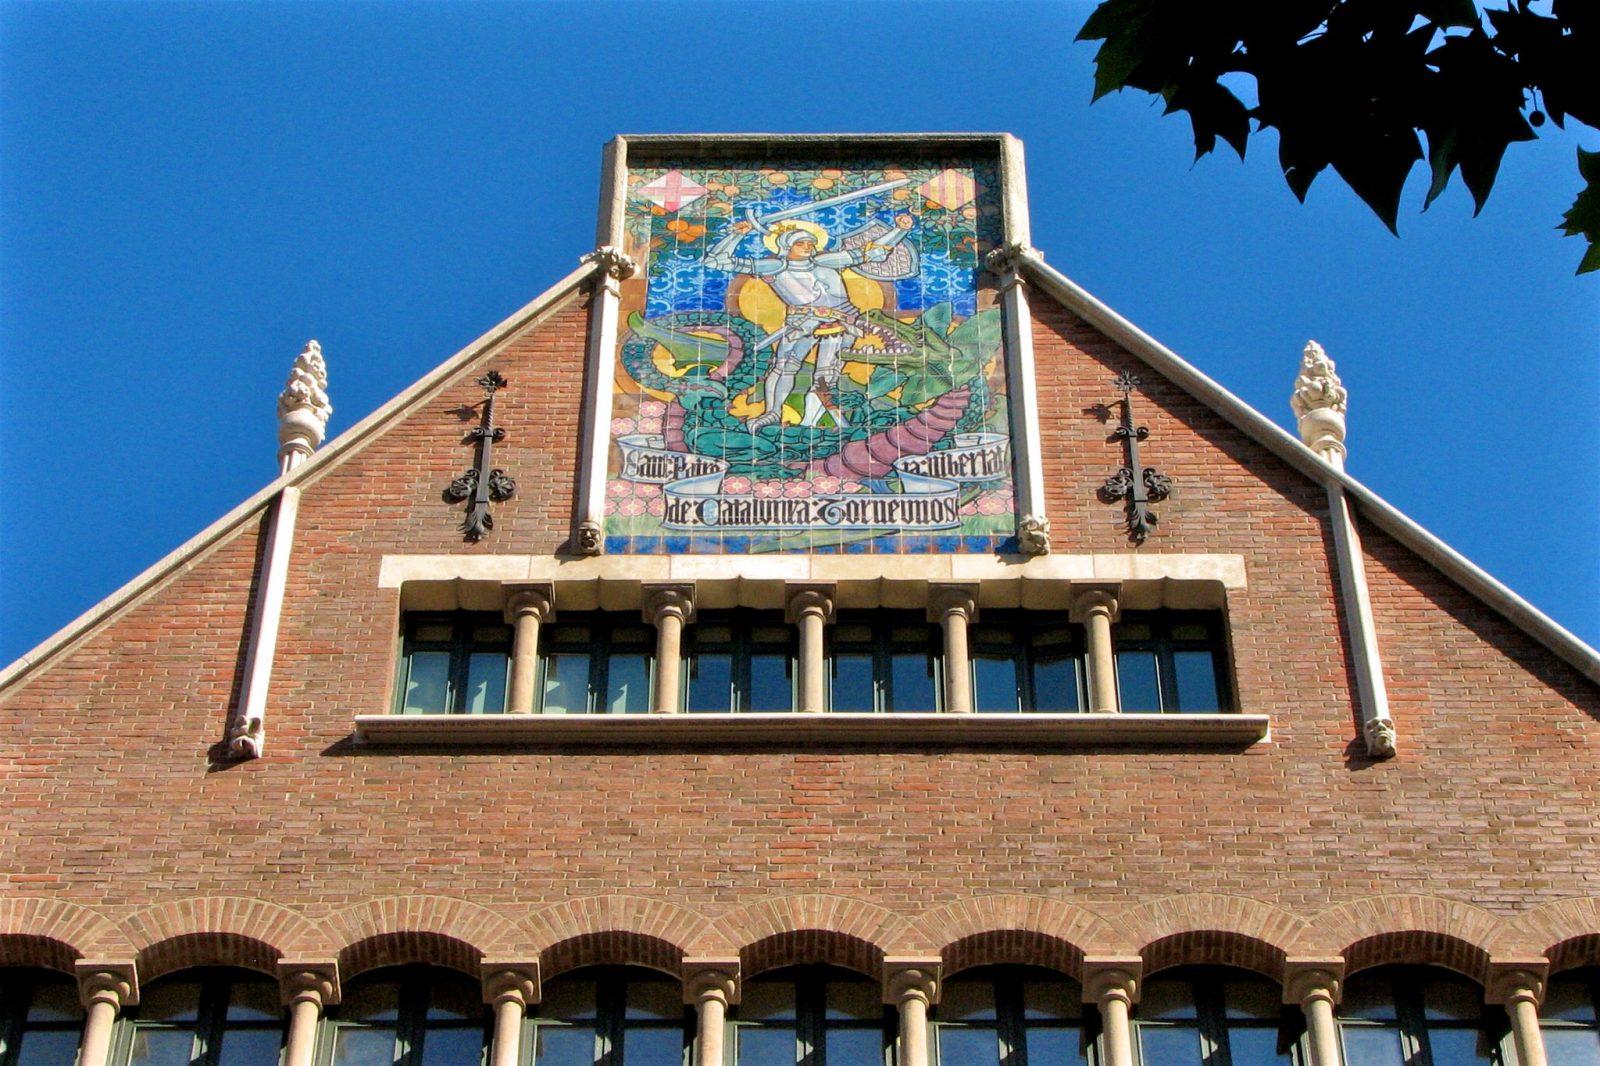 Панно с изображением Святого Георгия (Sant Jordi) (фото: Valentina Giannella)